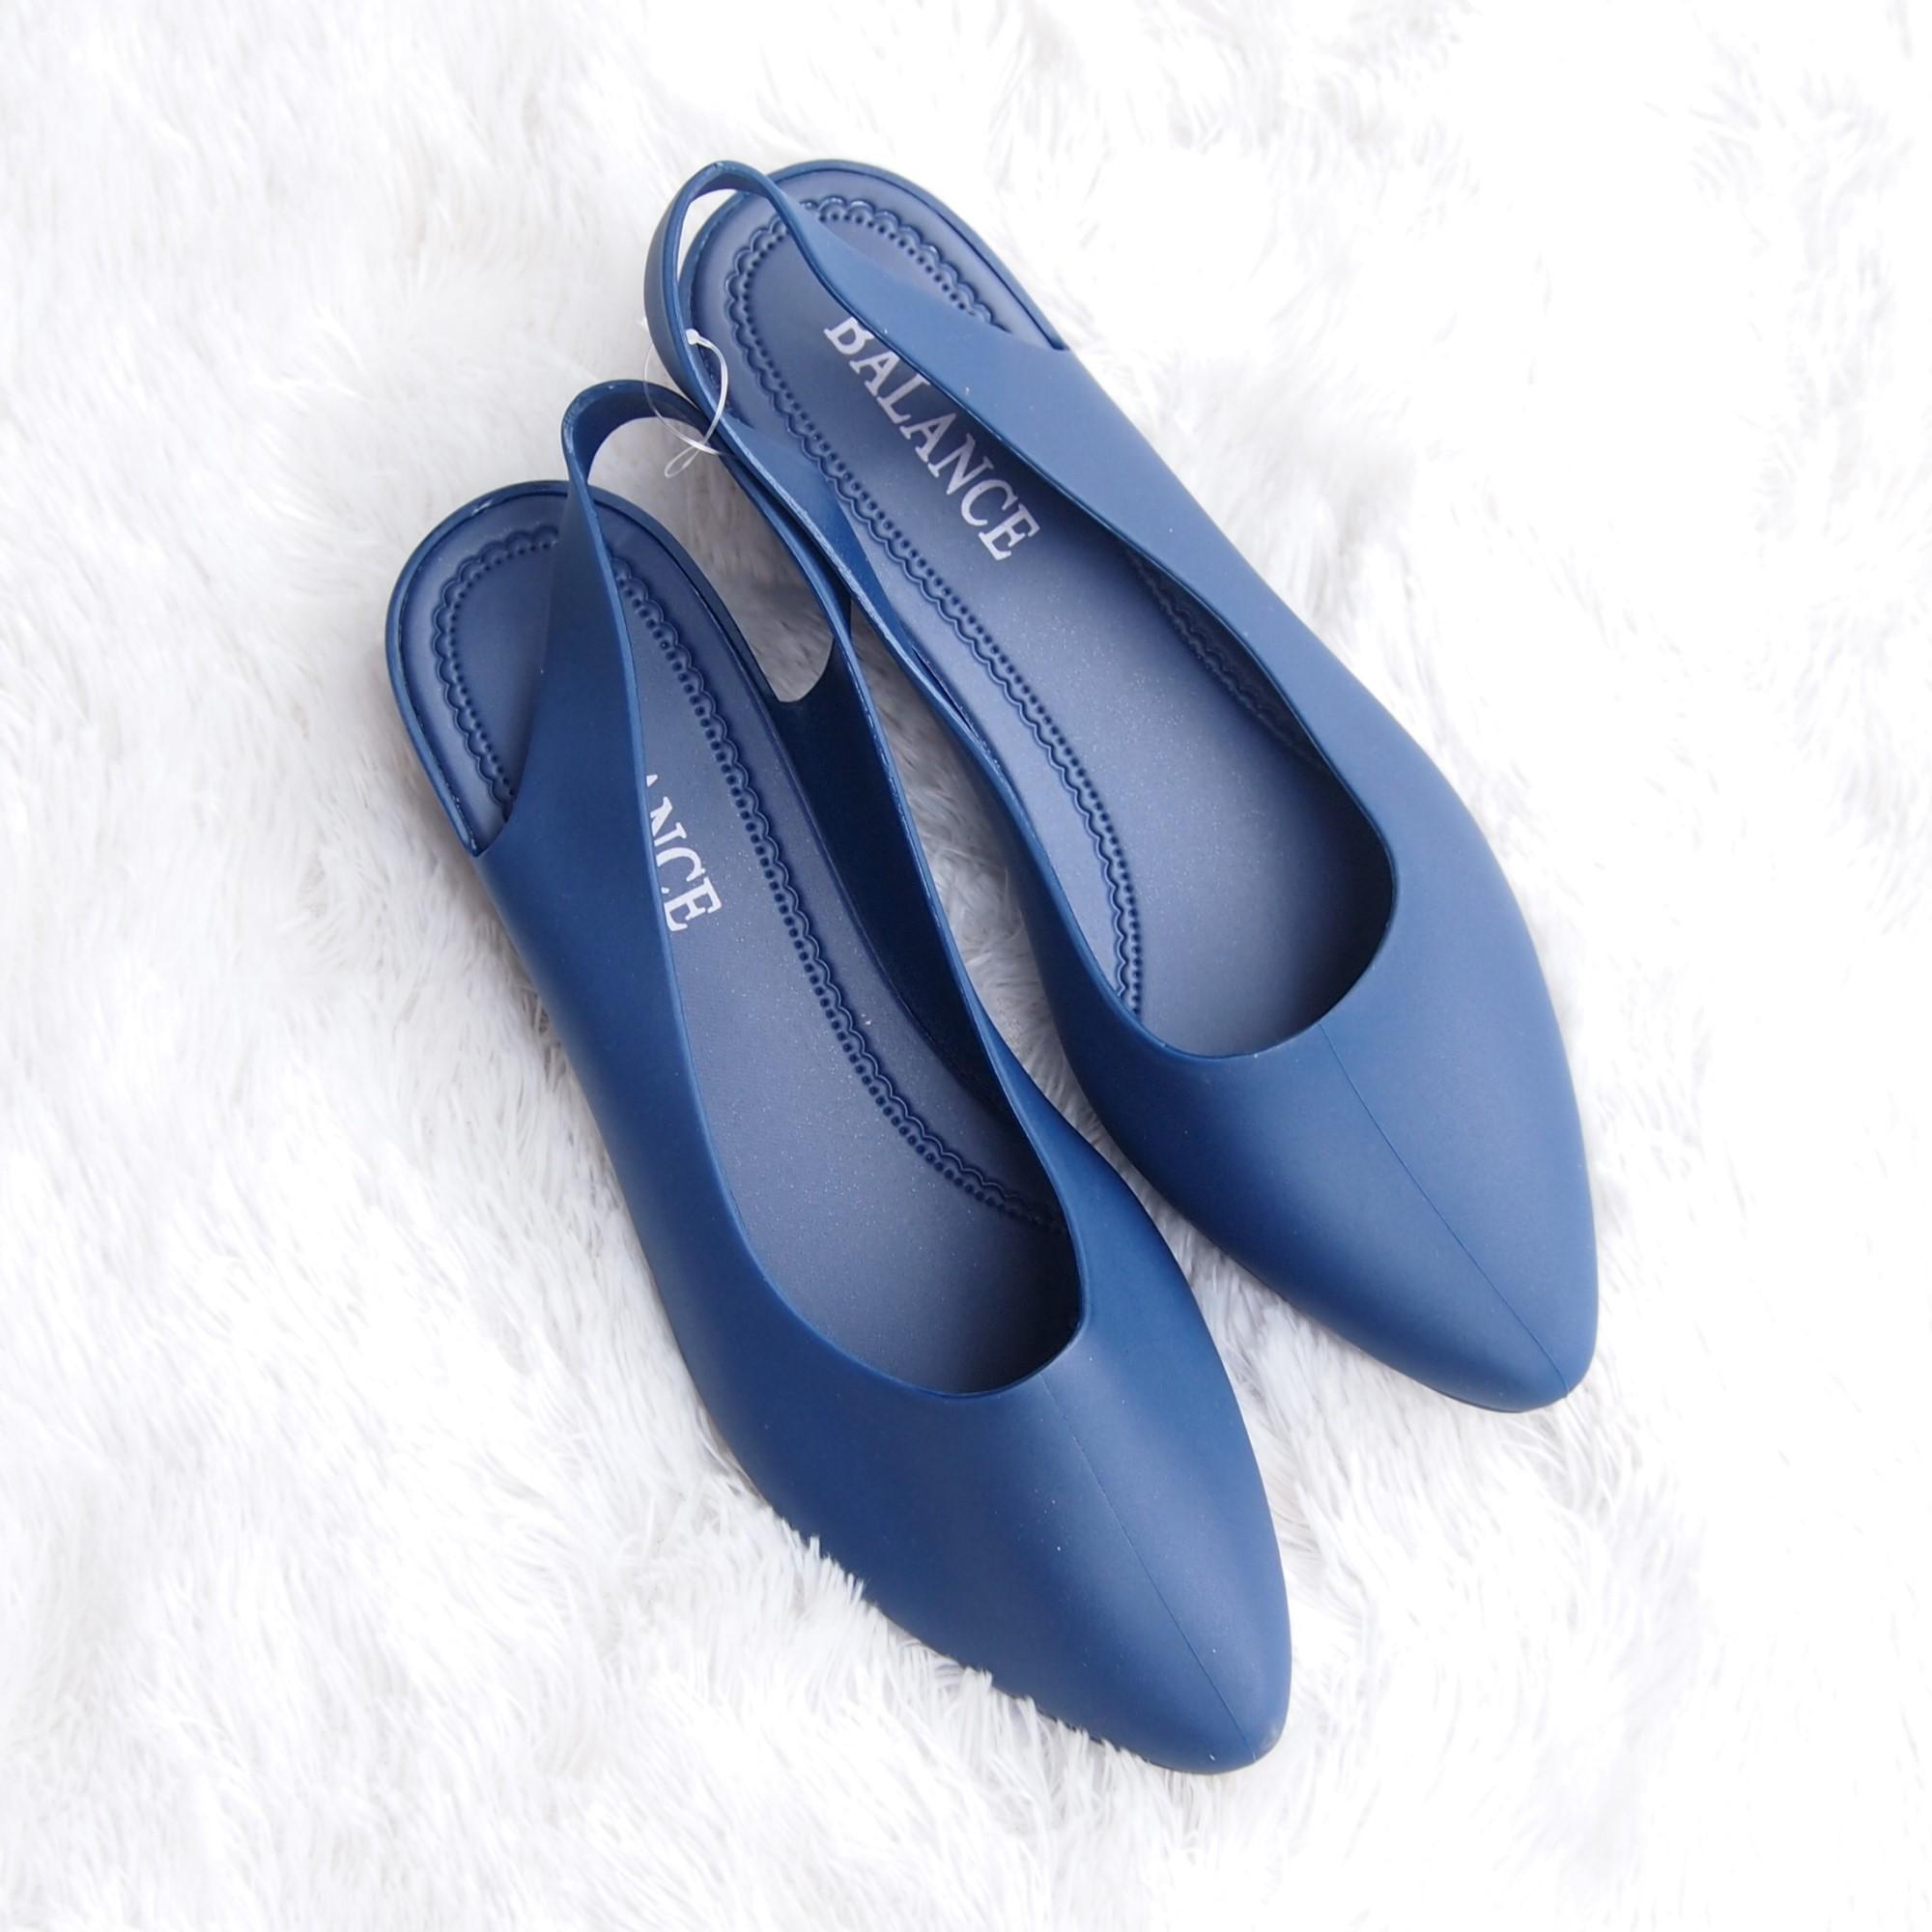 Sepatu Flat Shoes Wanita Trendi Lady Jelly Sendal Wedges Tali Belakang Cj L605 Warna Dikirim Random